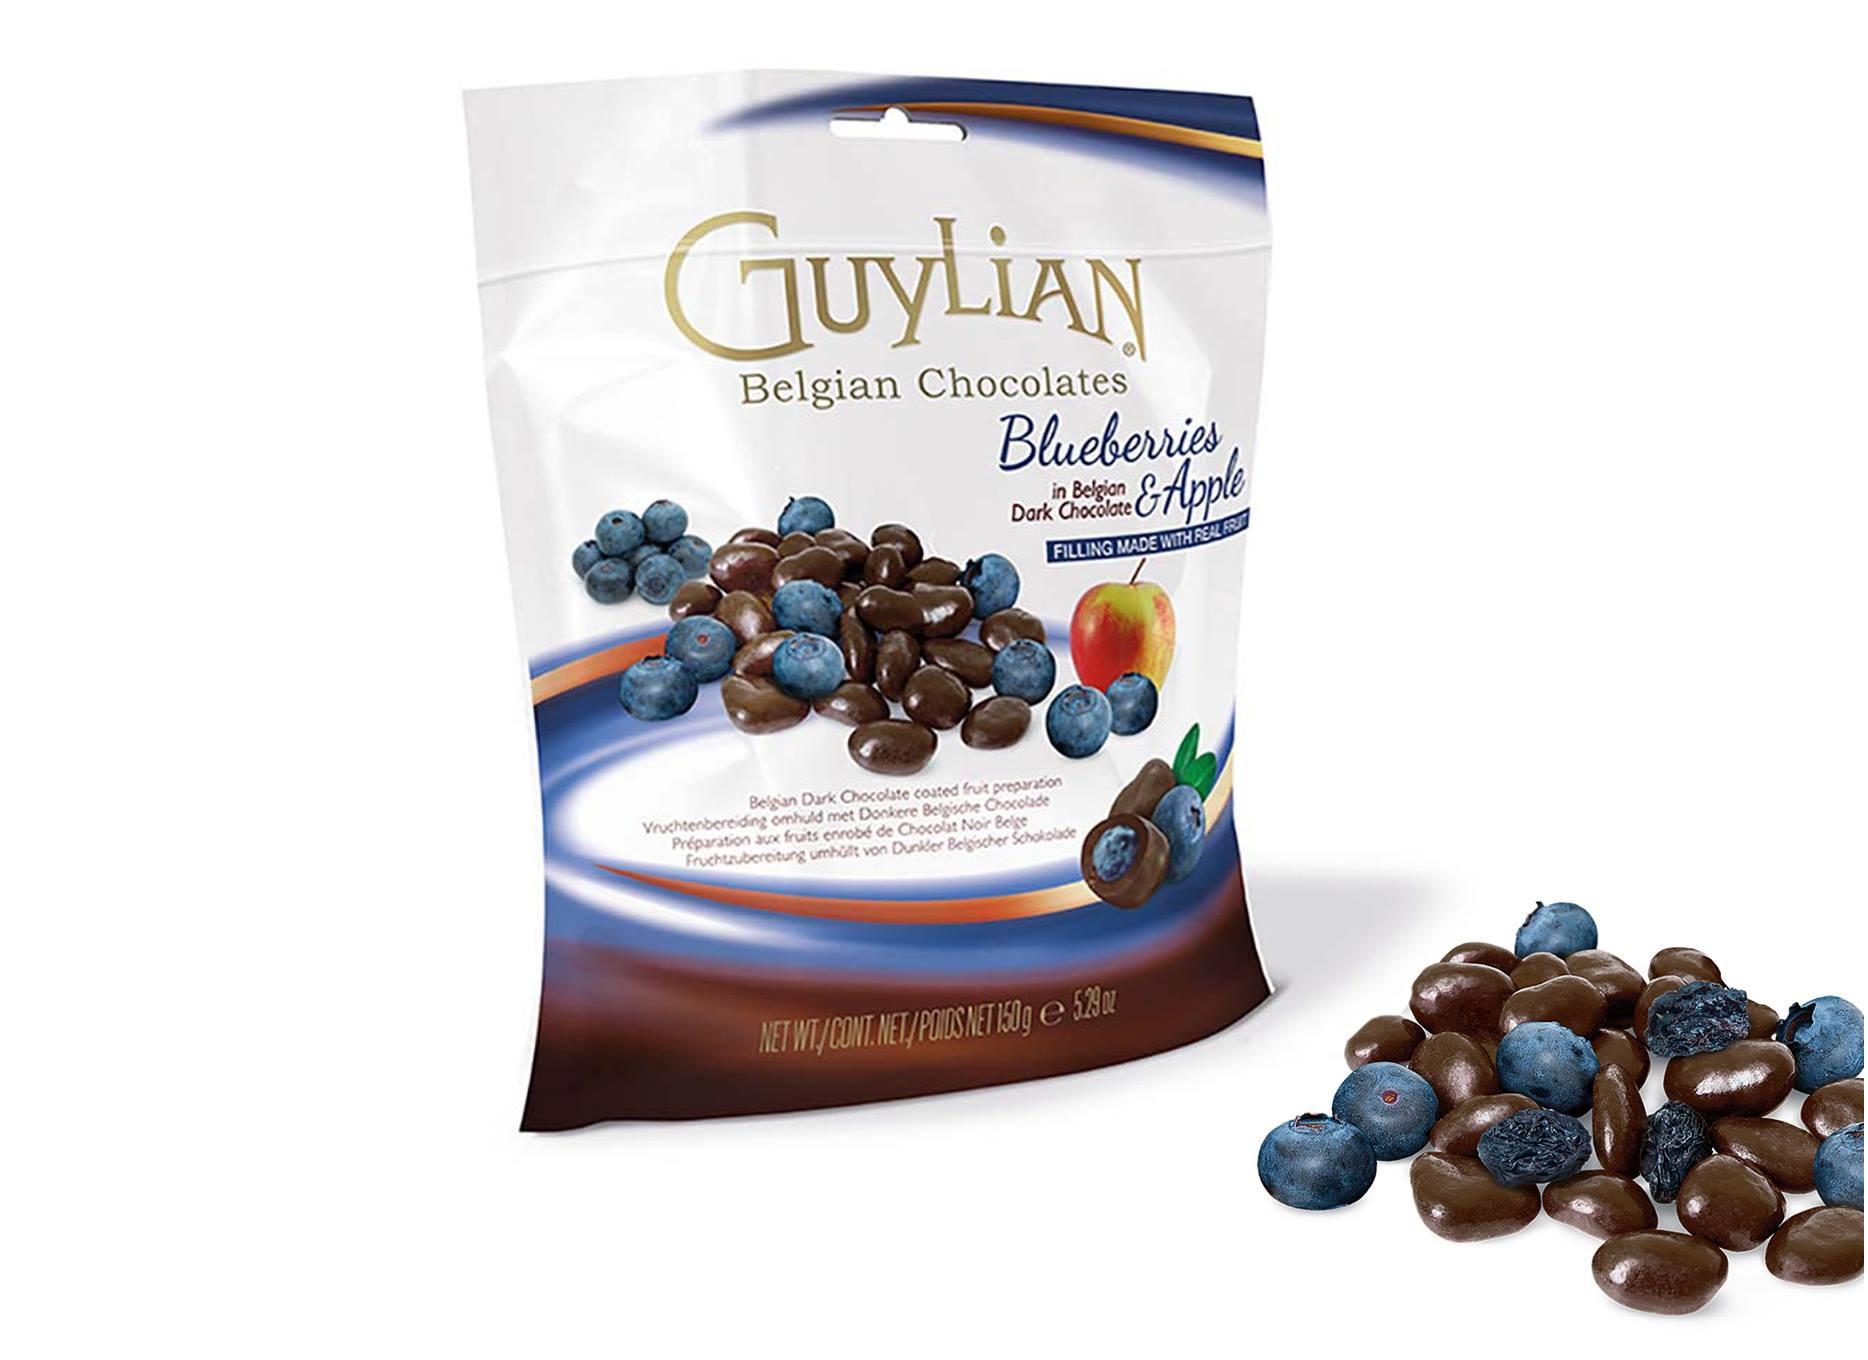 Guylian Belgian Chocolate Blueberries & Apple